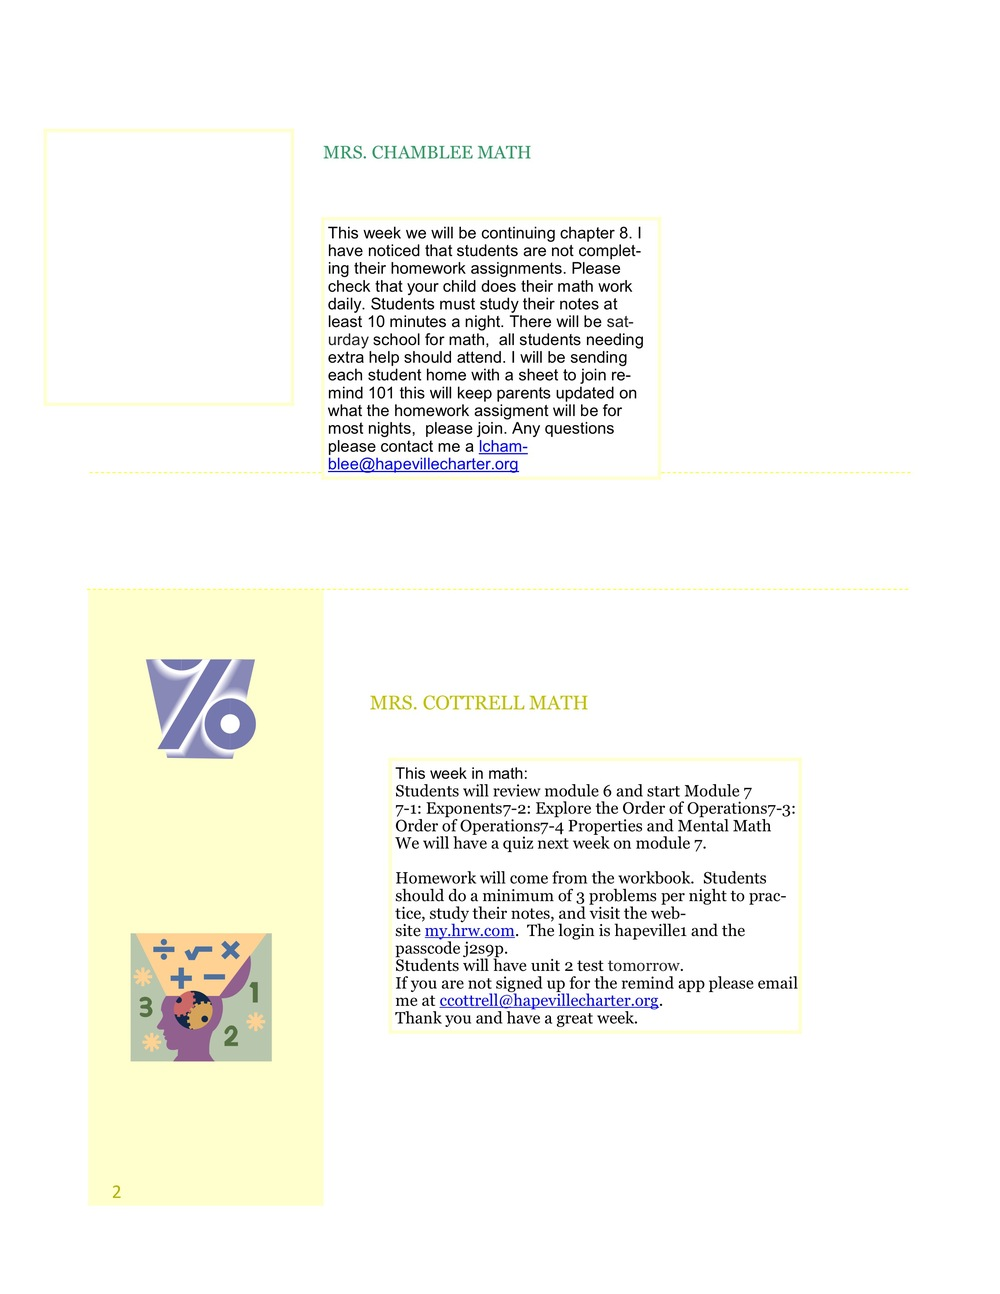 Newsletter Image6th grade January 20-23 2.jpeg